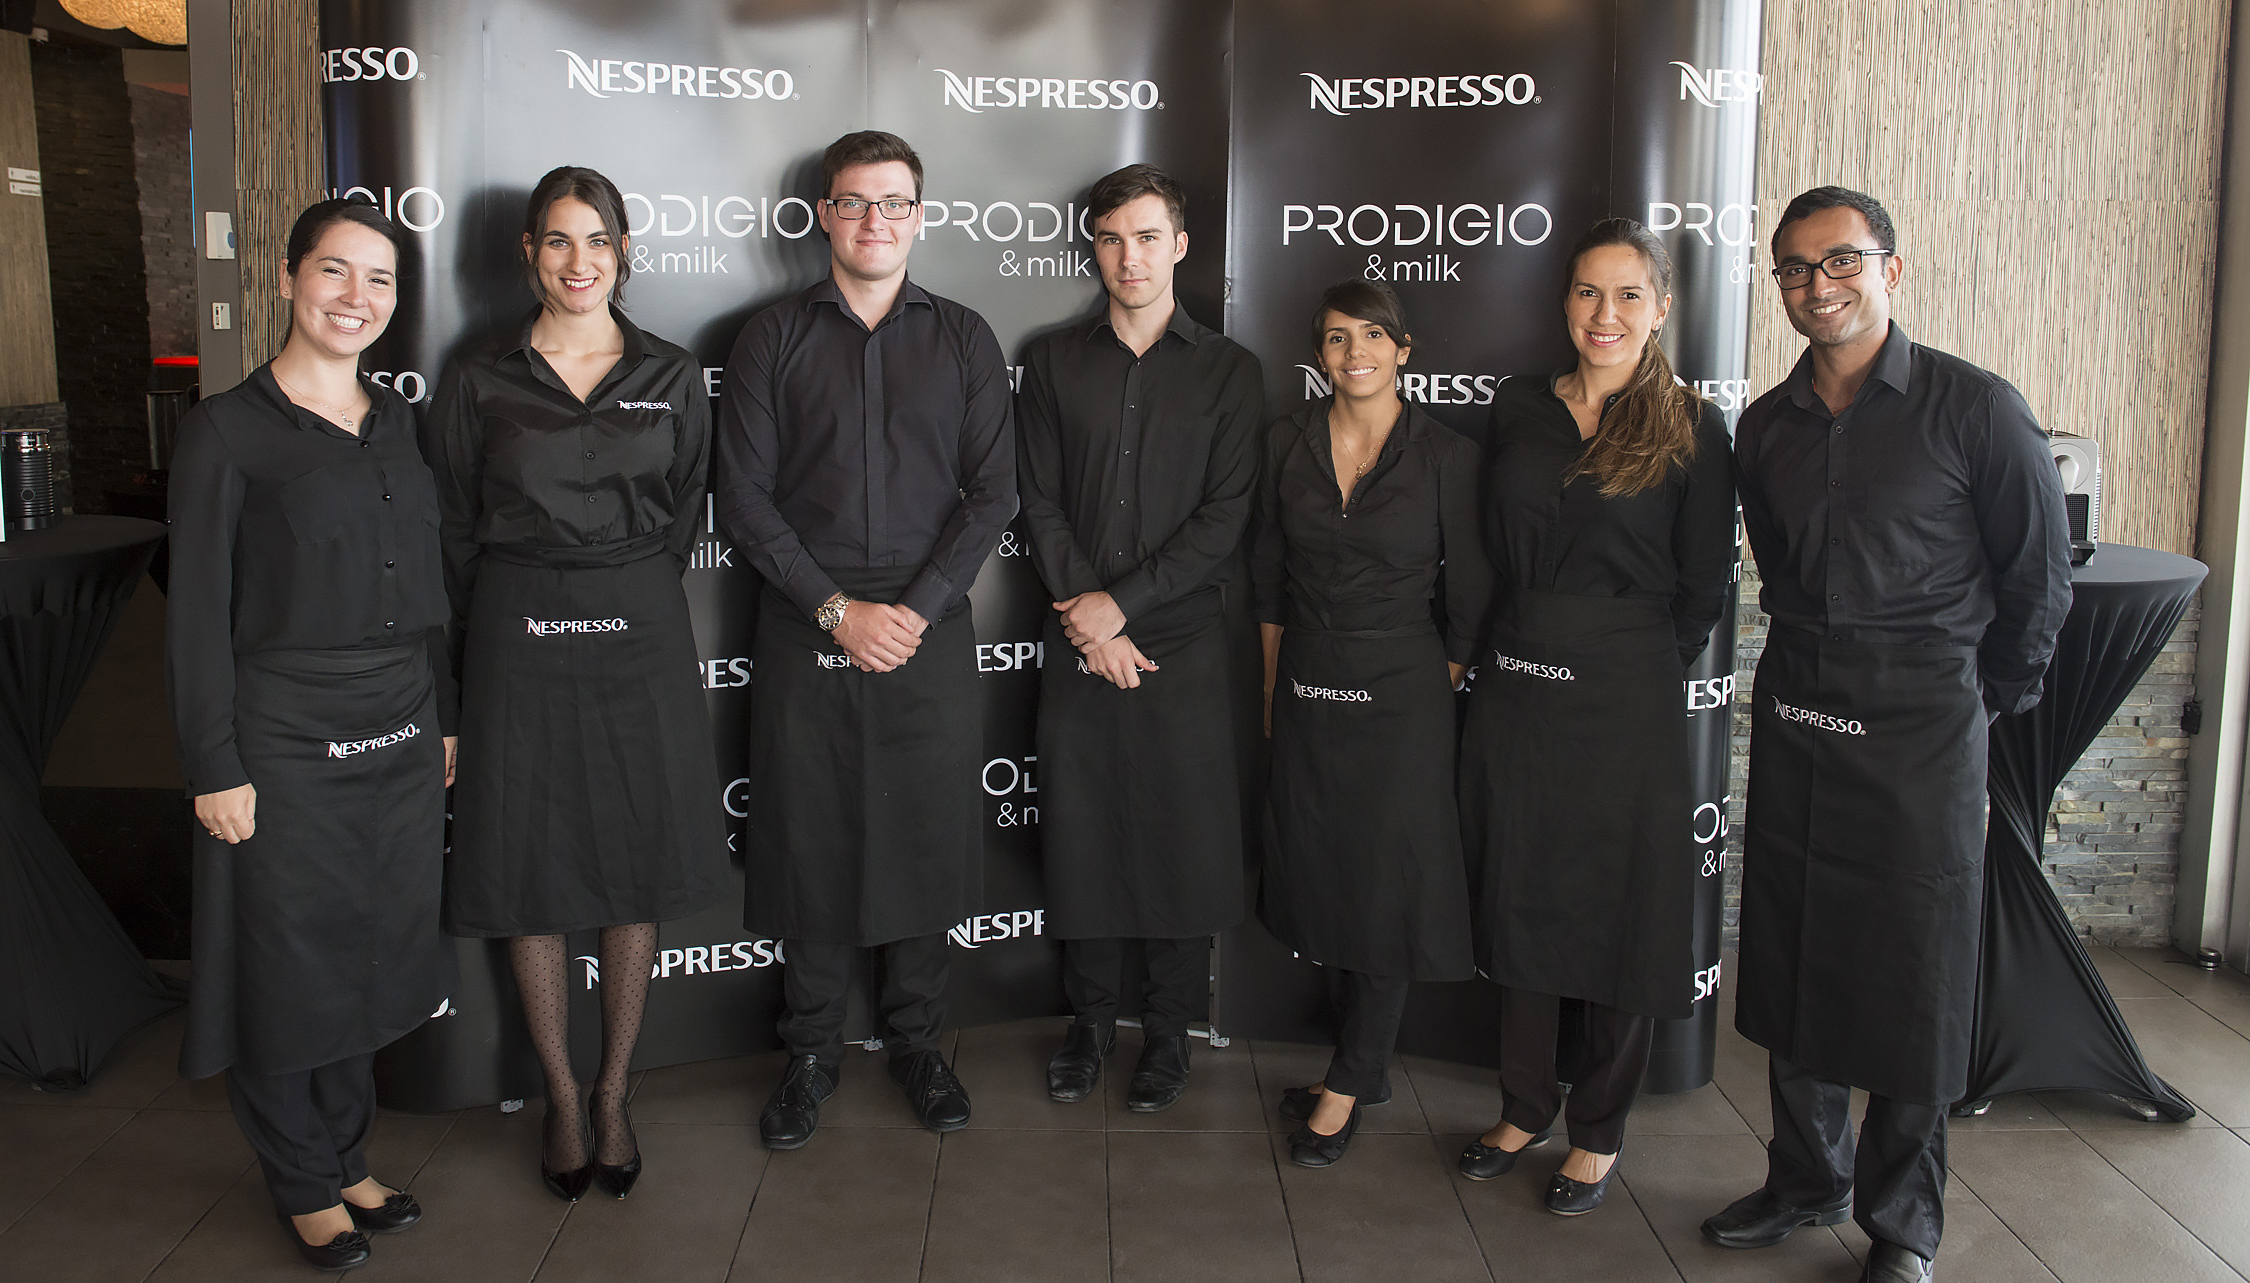 nespresso mesh team